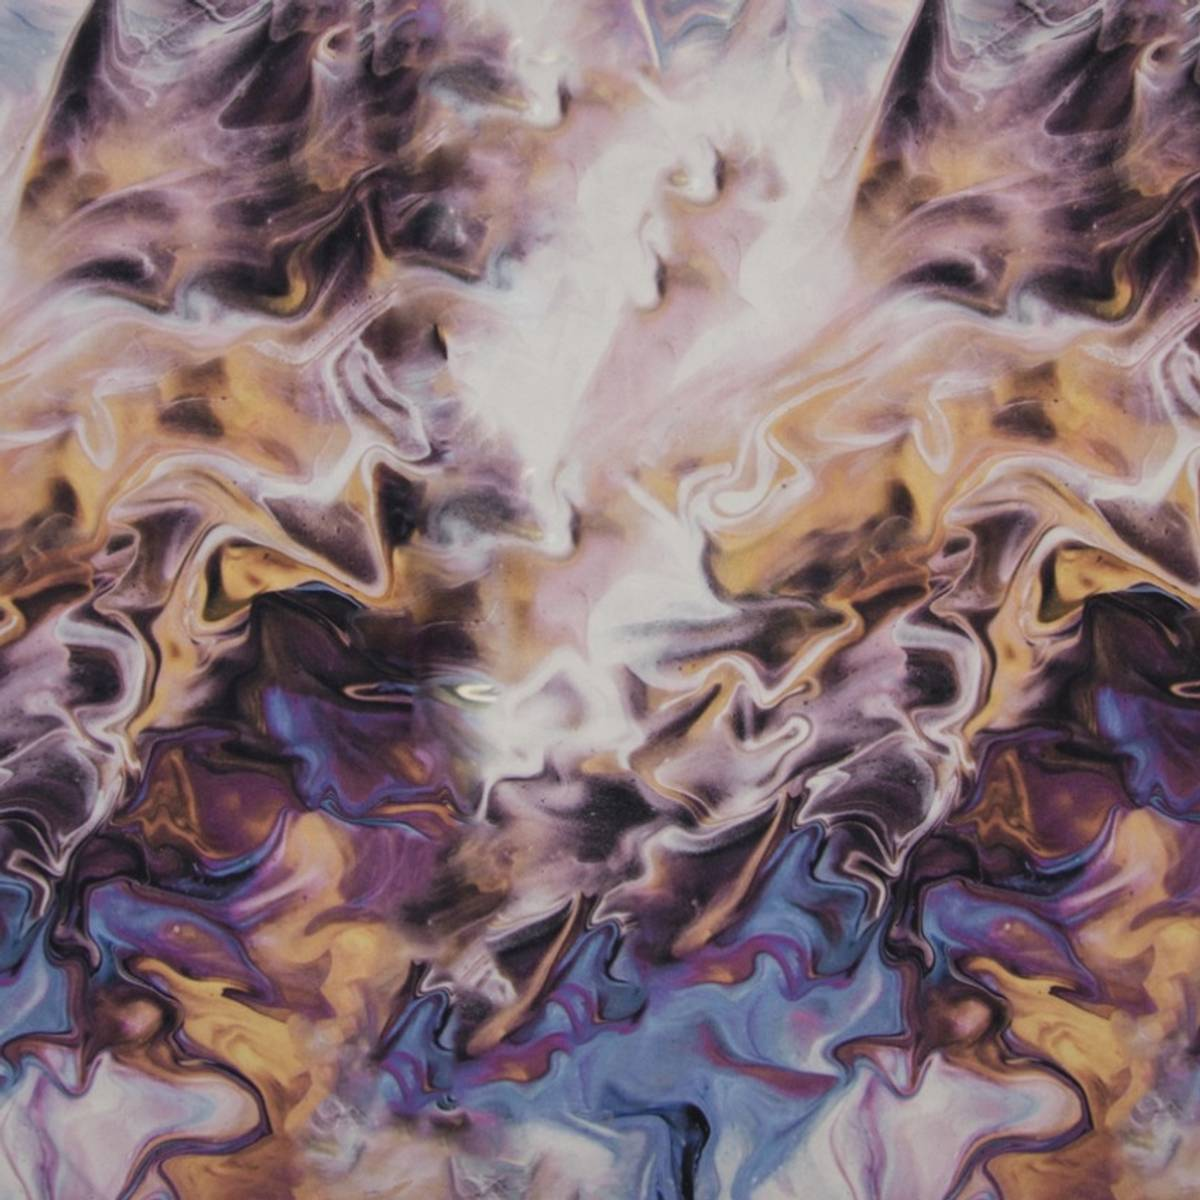 50 cm Yoga Stretchjersey - marmorert fargeeksplosjon